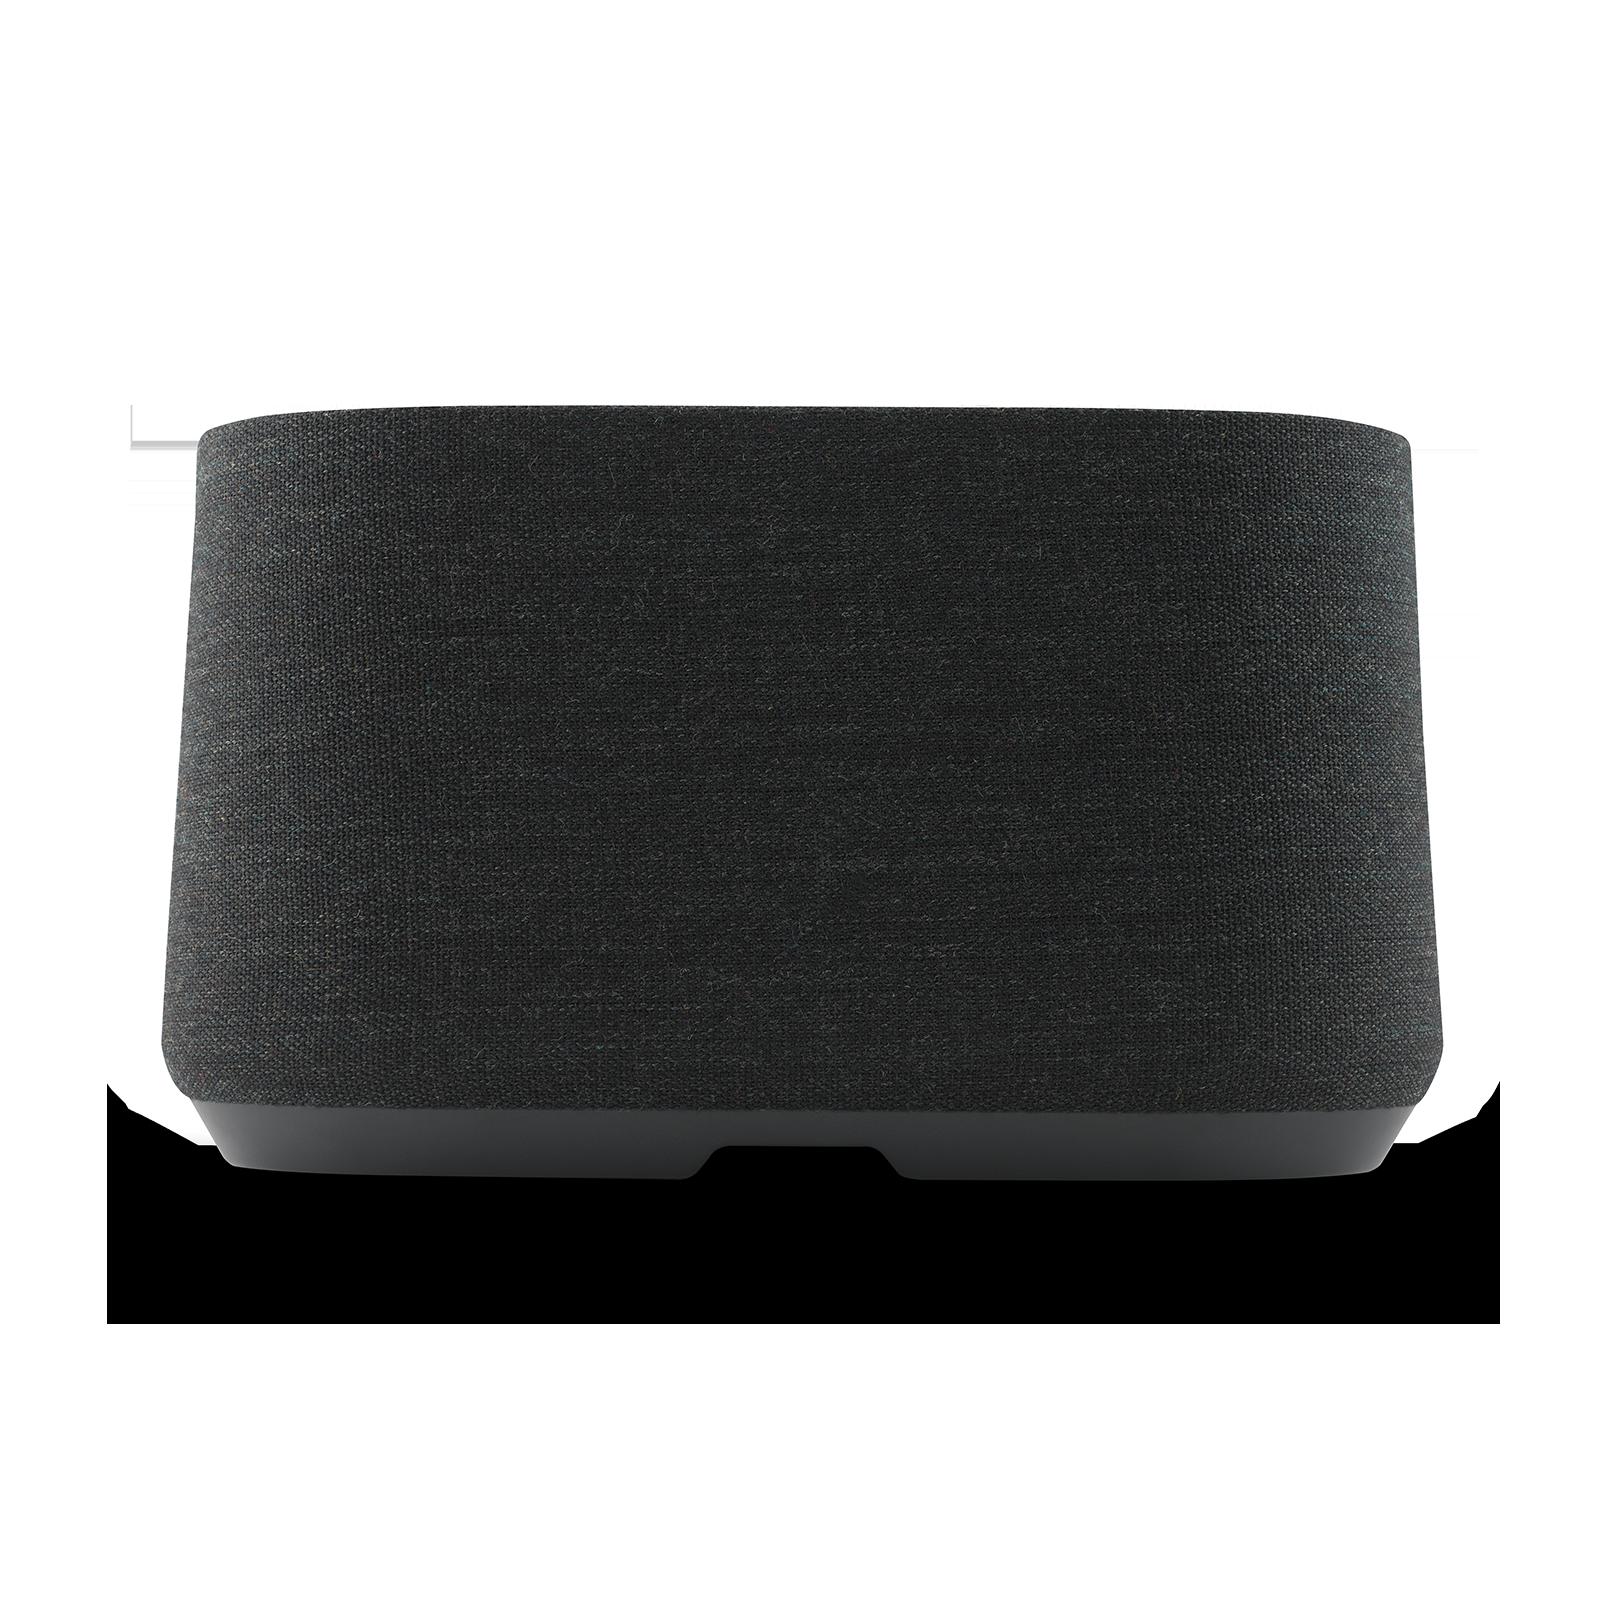 Harman Kardon Citation 300 - Black - The medium-size smart home speaker with award winning design - Back